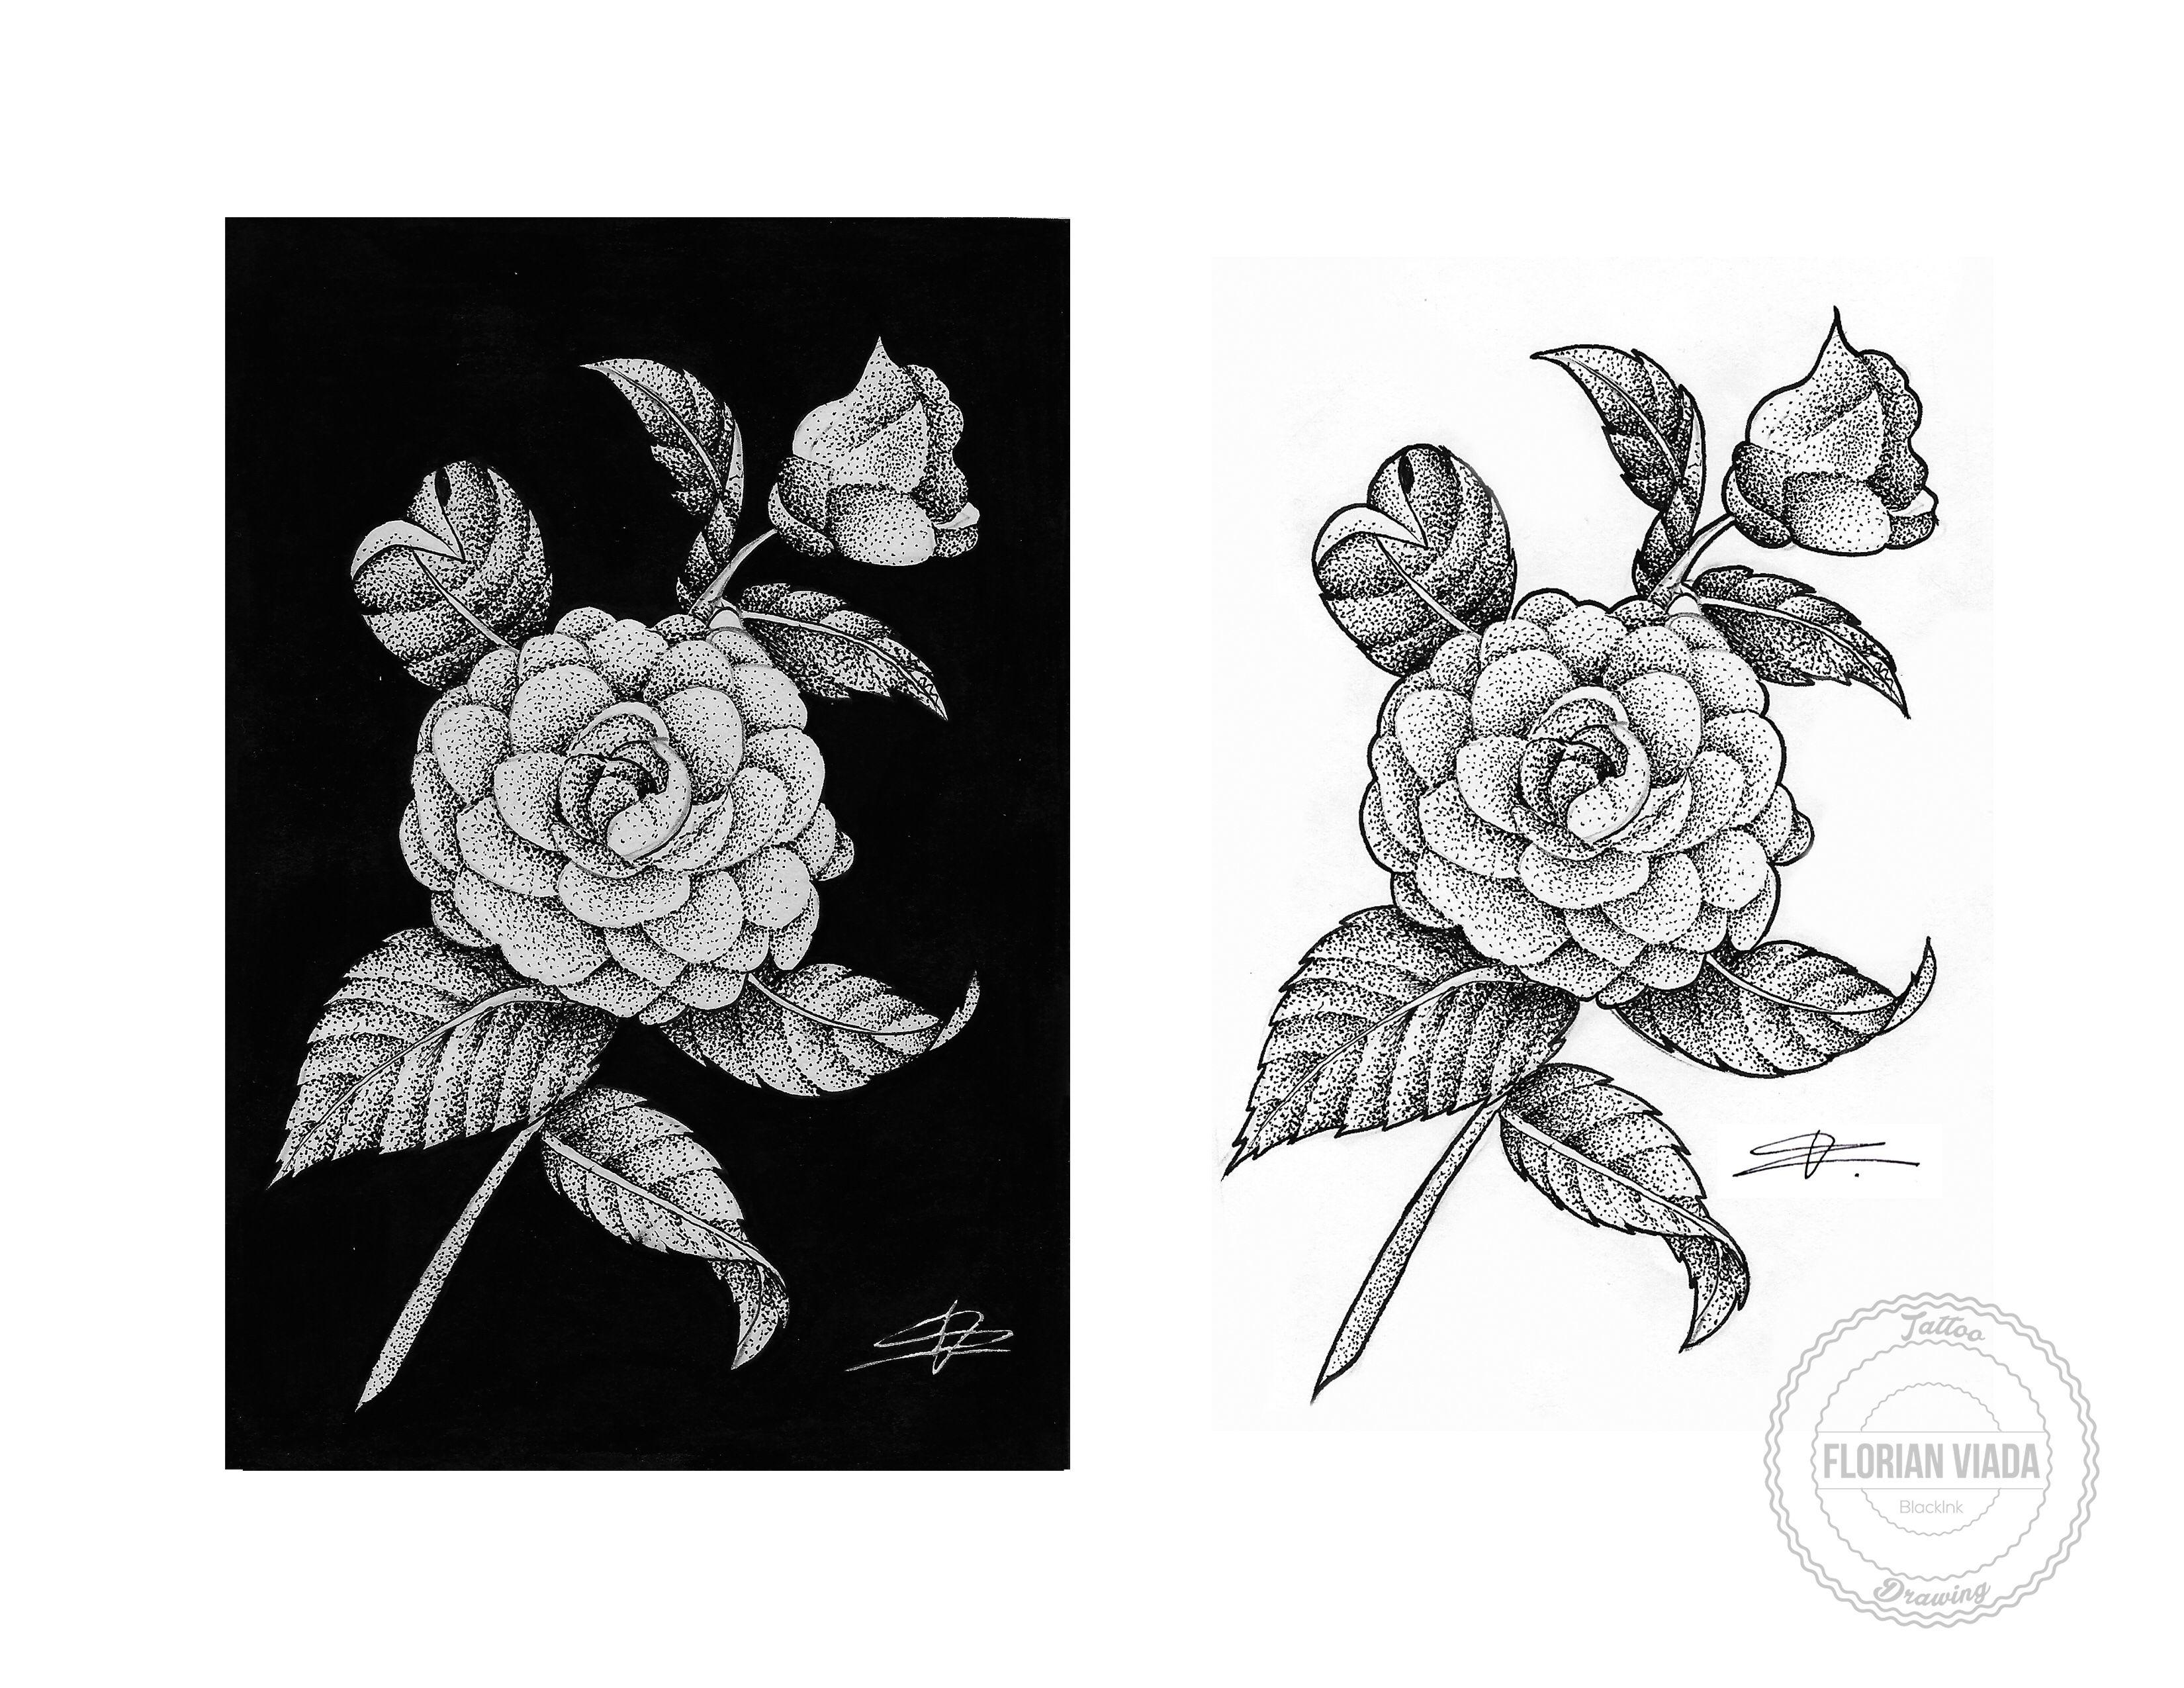 Florianviada Tattoo Florian Viada Florianv Dotwork Dessin